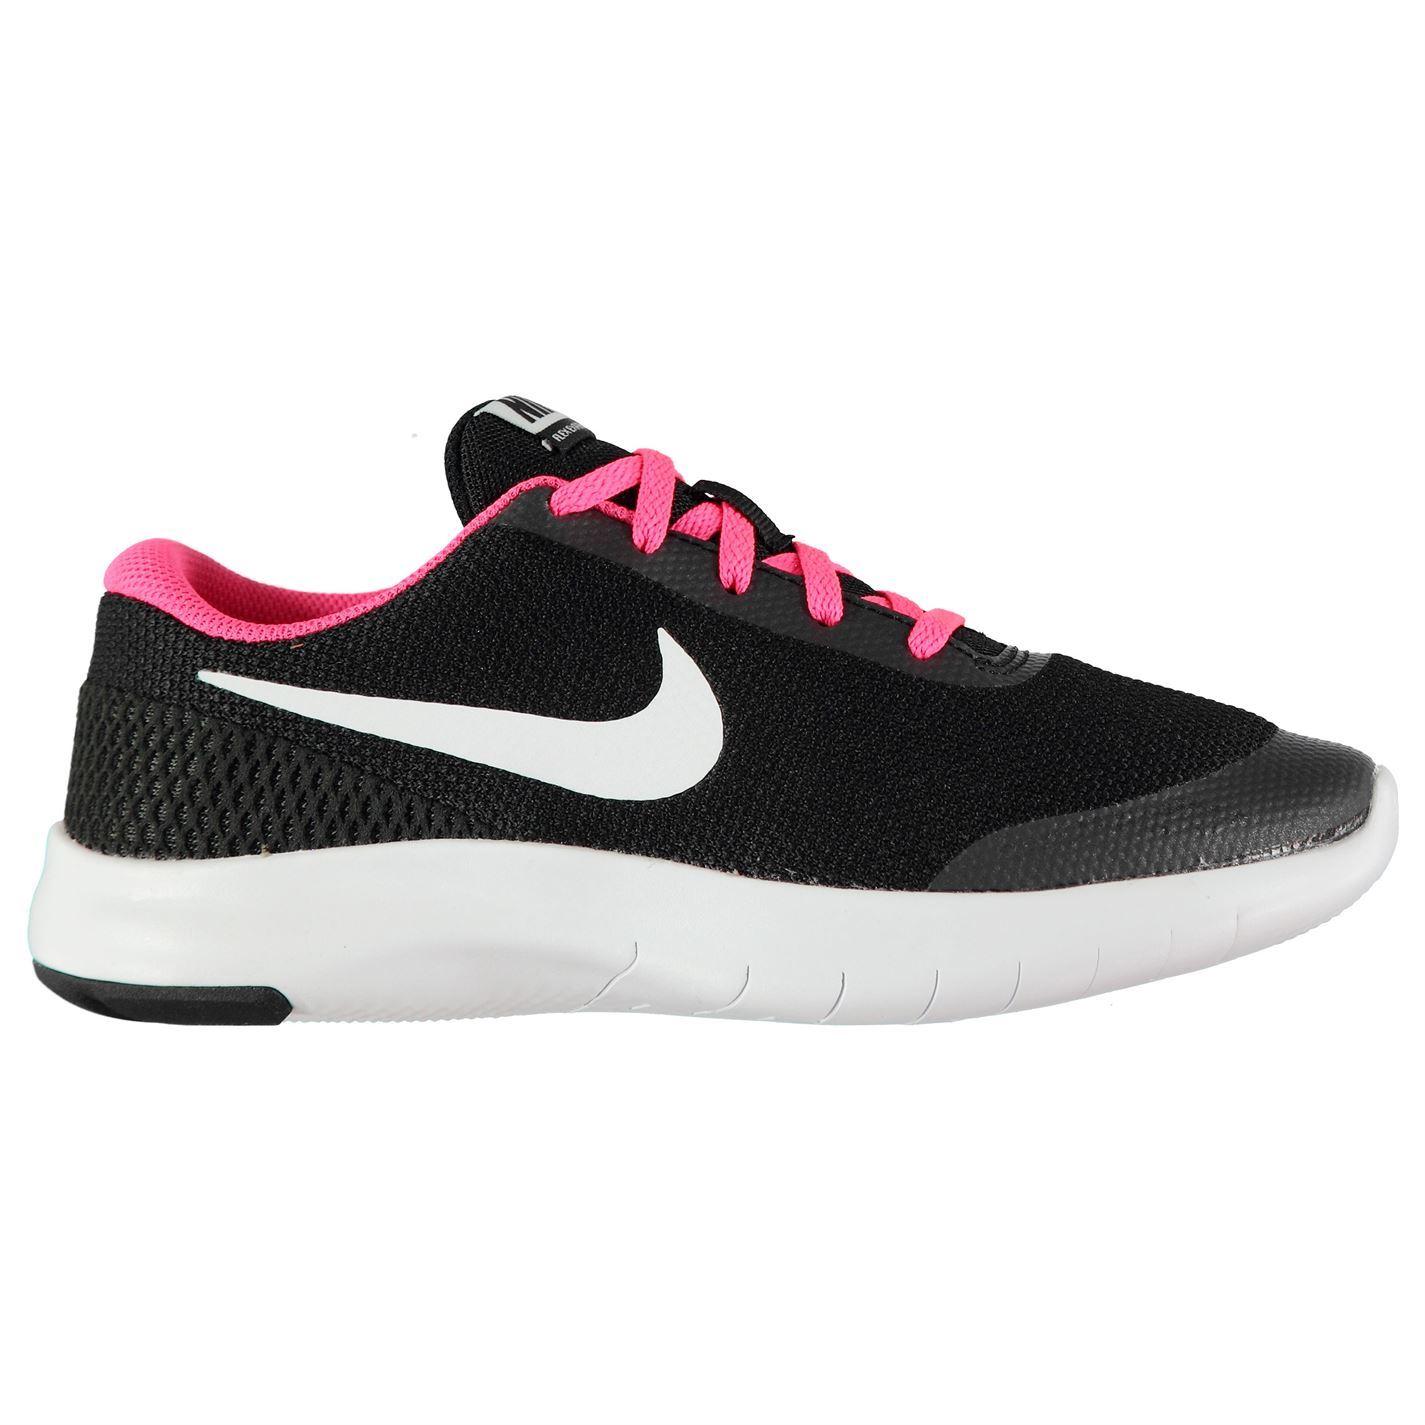 3b88dabaae45 ... Nike Flex Experience 7 Junior Girls Trainers Shoes Footwear ...